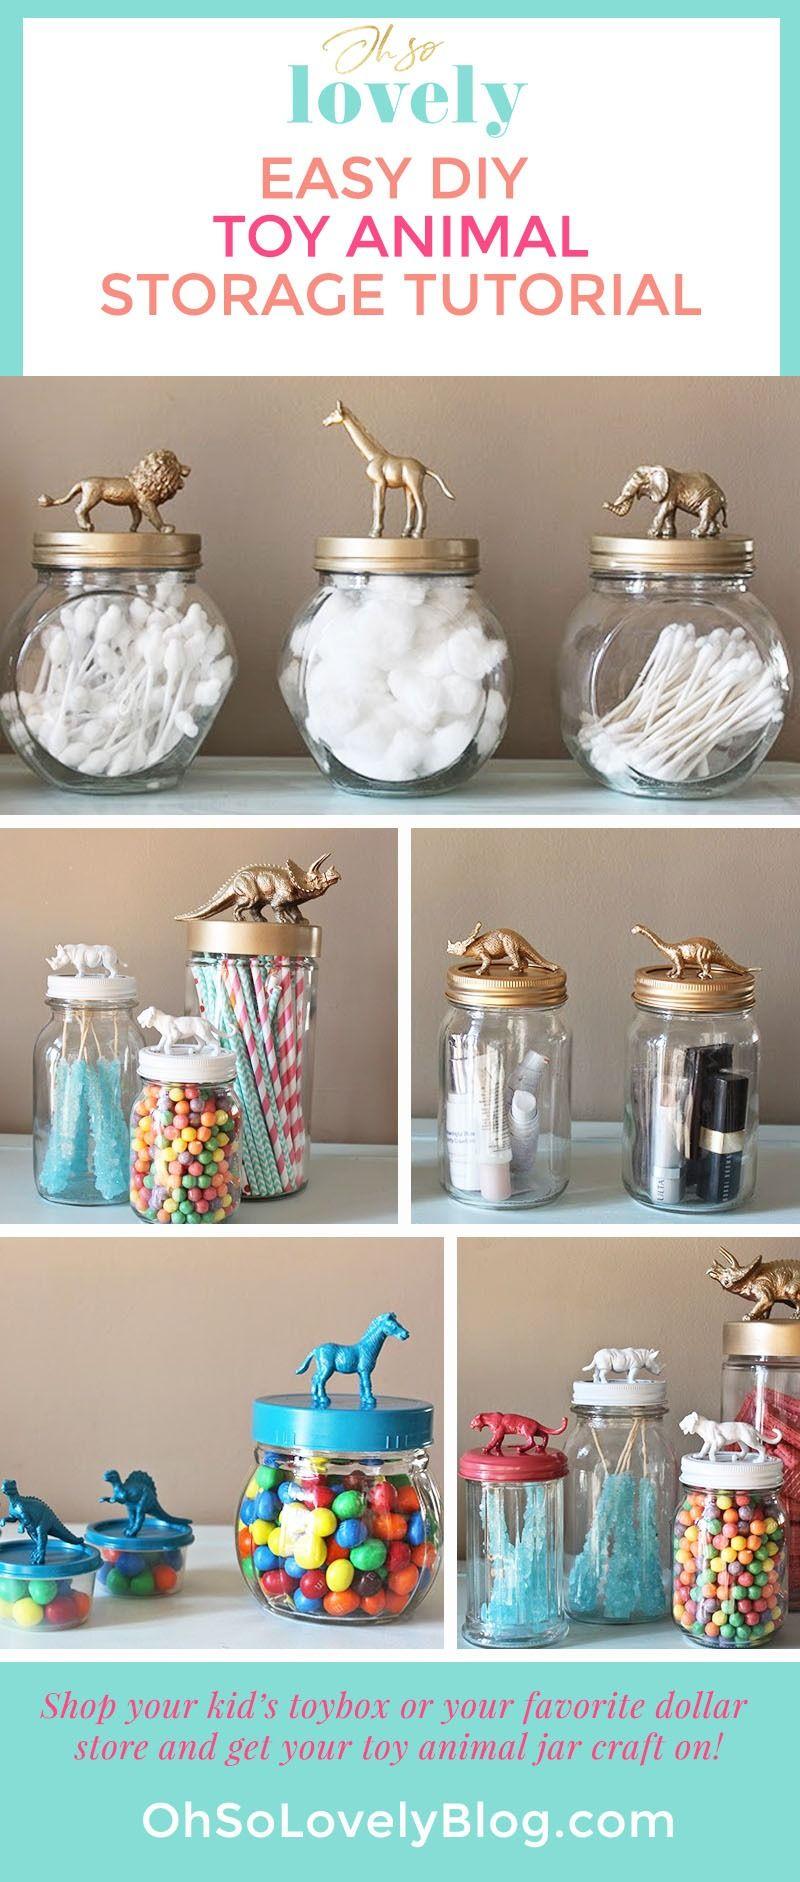 Easy Affordable And Fun Diy Toy Animal Jar Tutorial Easy Mason Jar Crafts Diy Mason Jar Crafts Diy Animal Jar